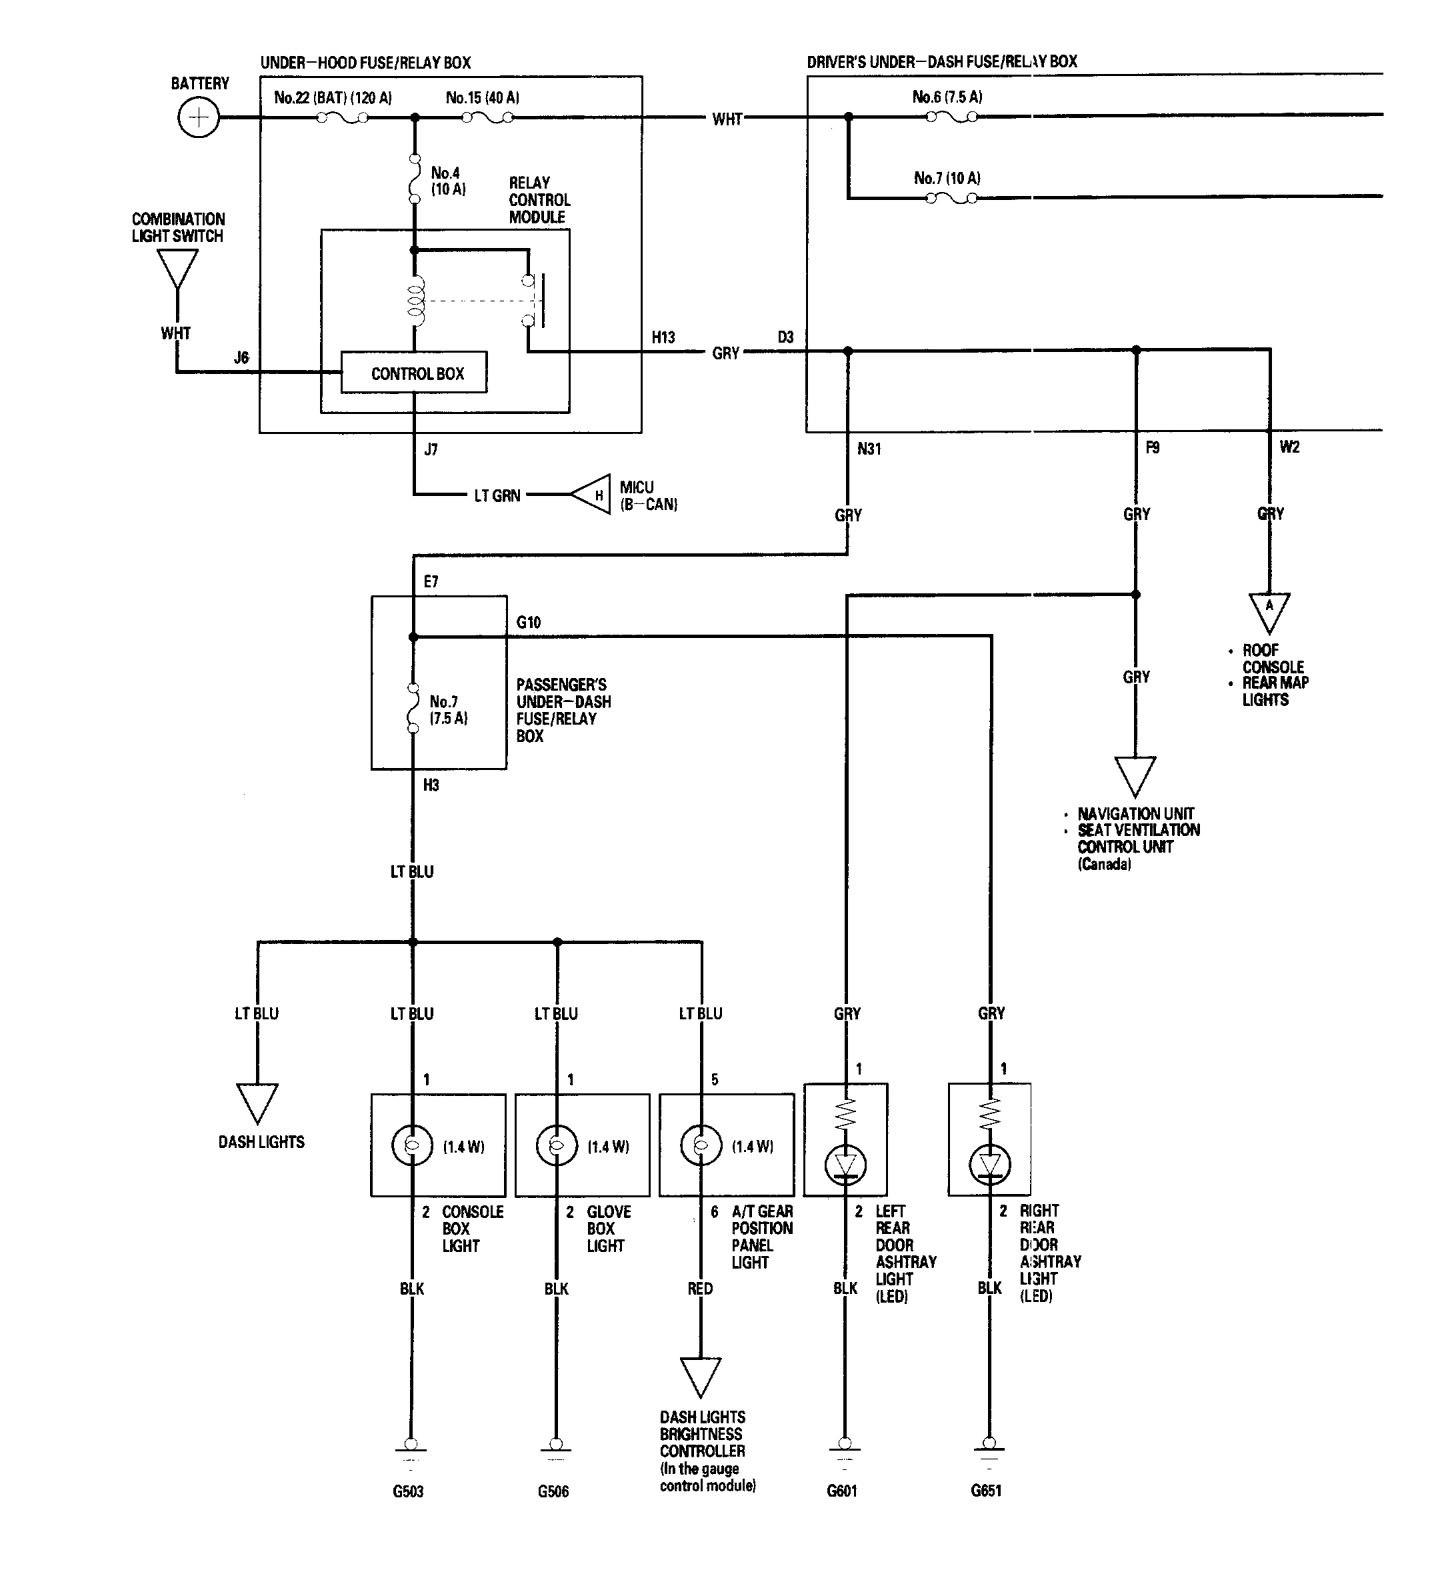 hight resolution of acura rl wiring diagram interior lighting part 1